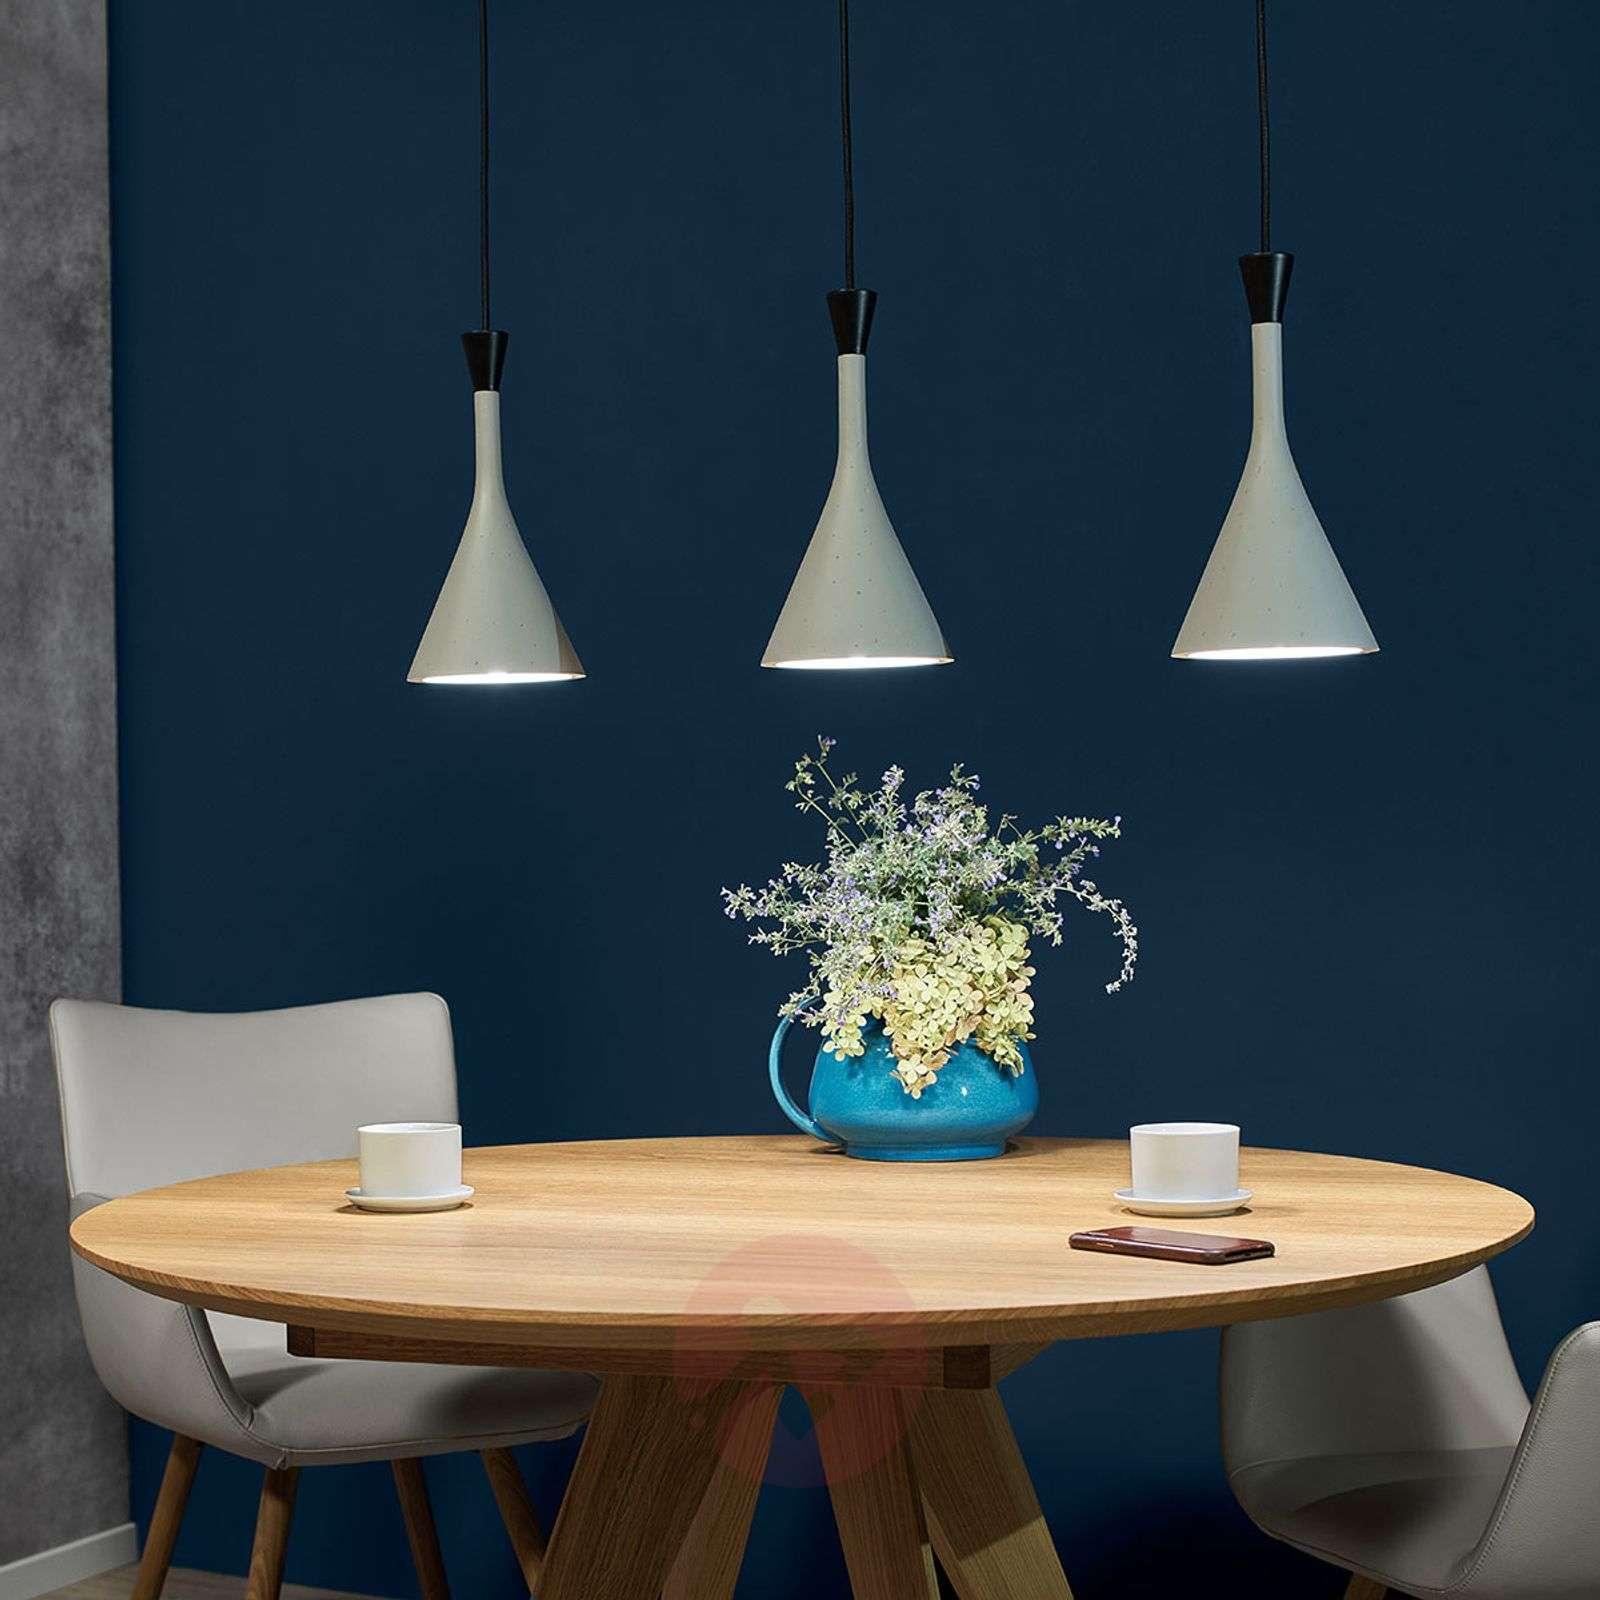 Roddik 3-bulb pendant light-9004759-013